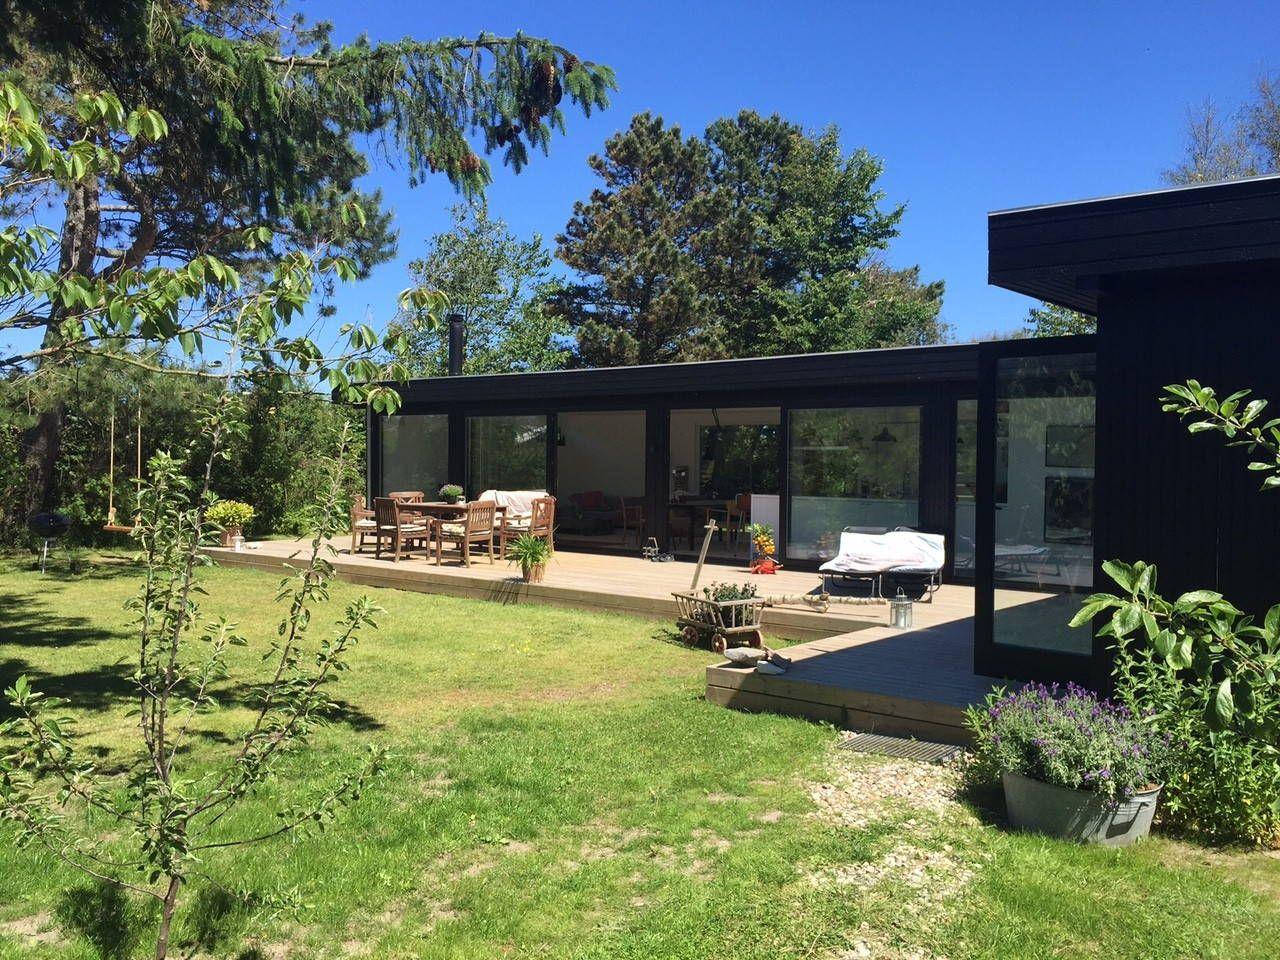 Haus in Vejby, Dänemark. Private beachaccess 100 m. Nordic